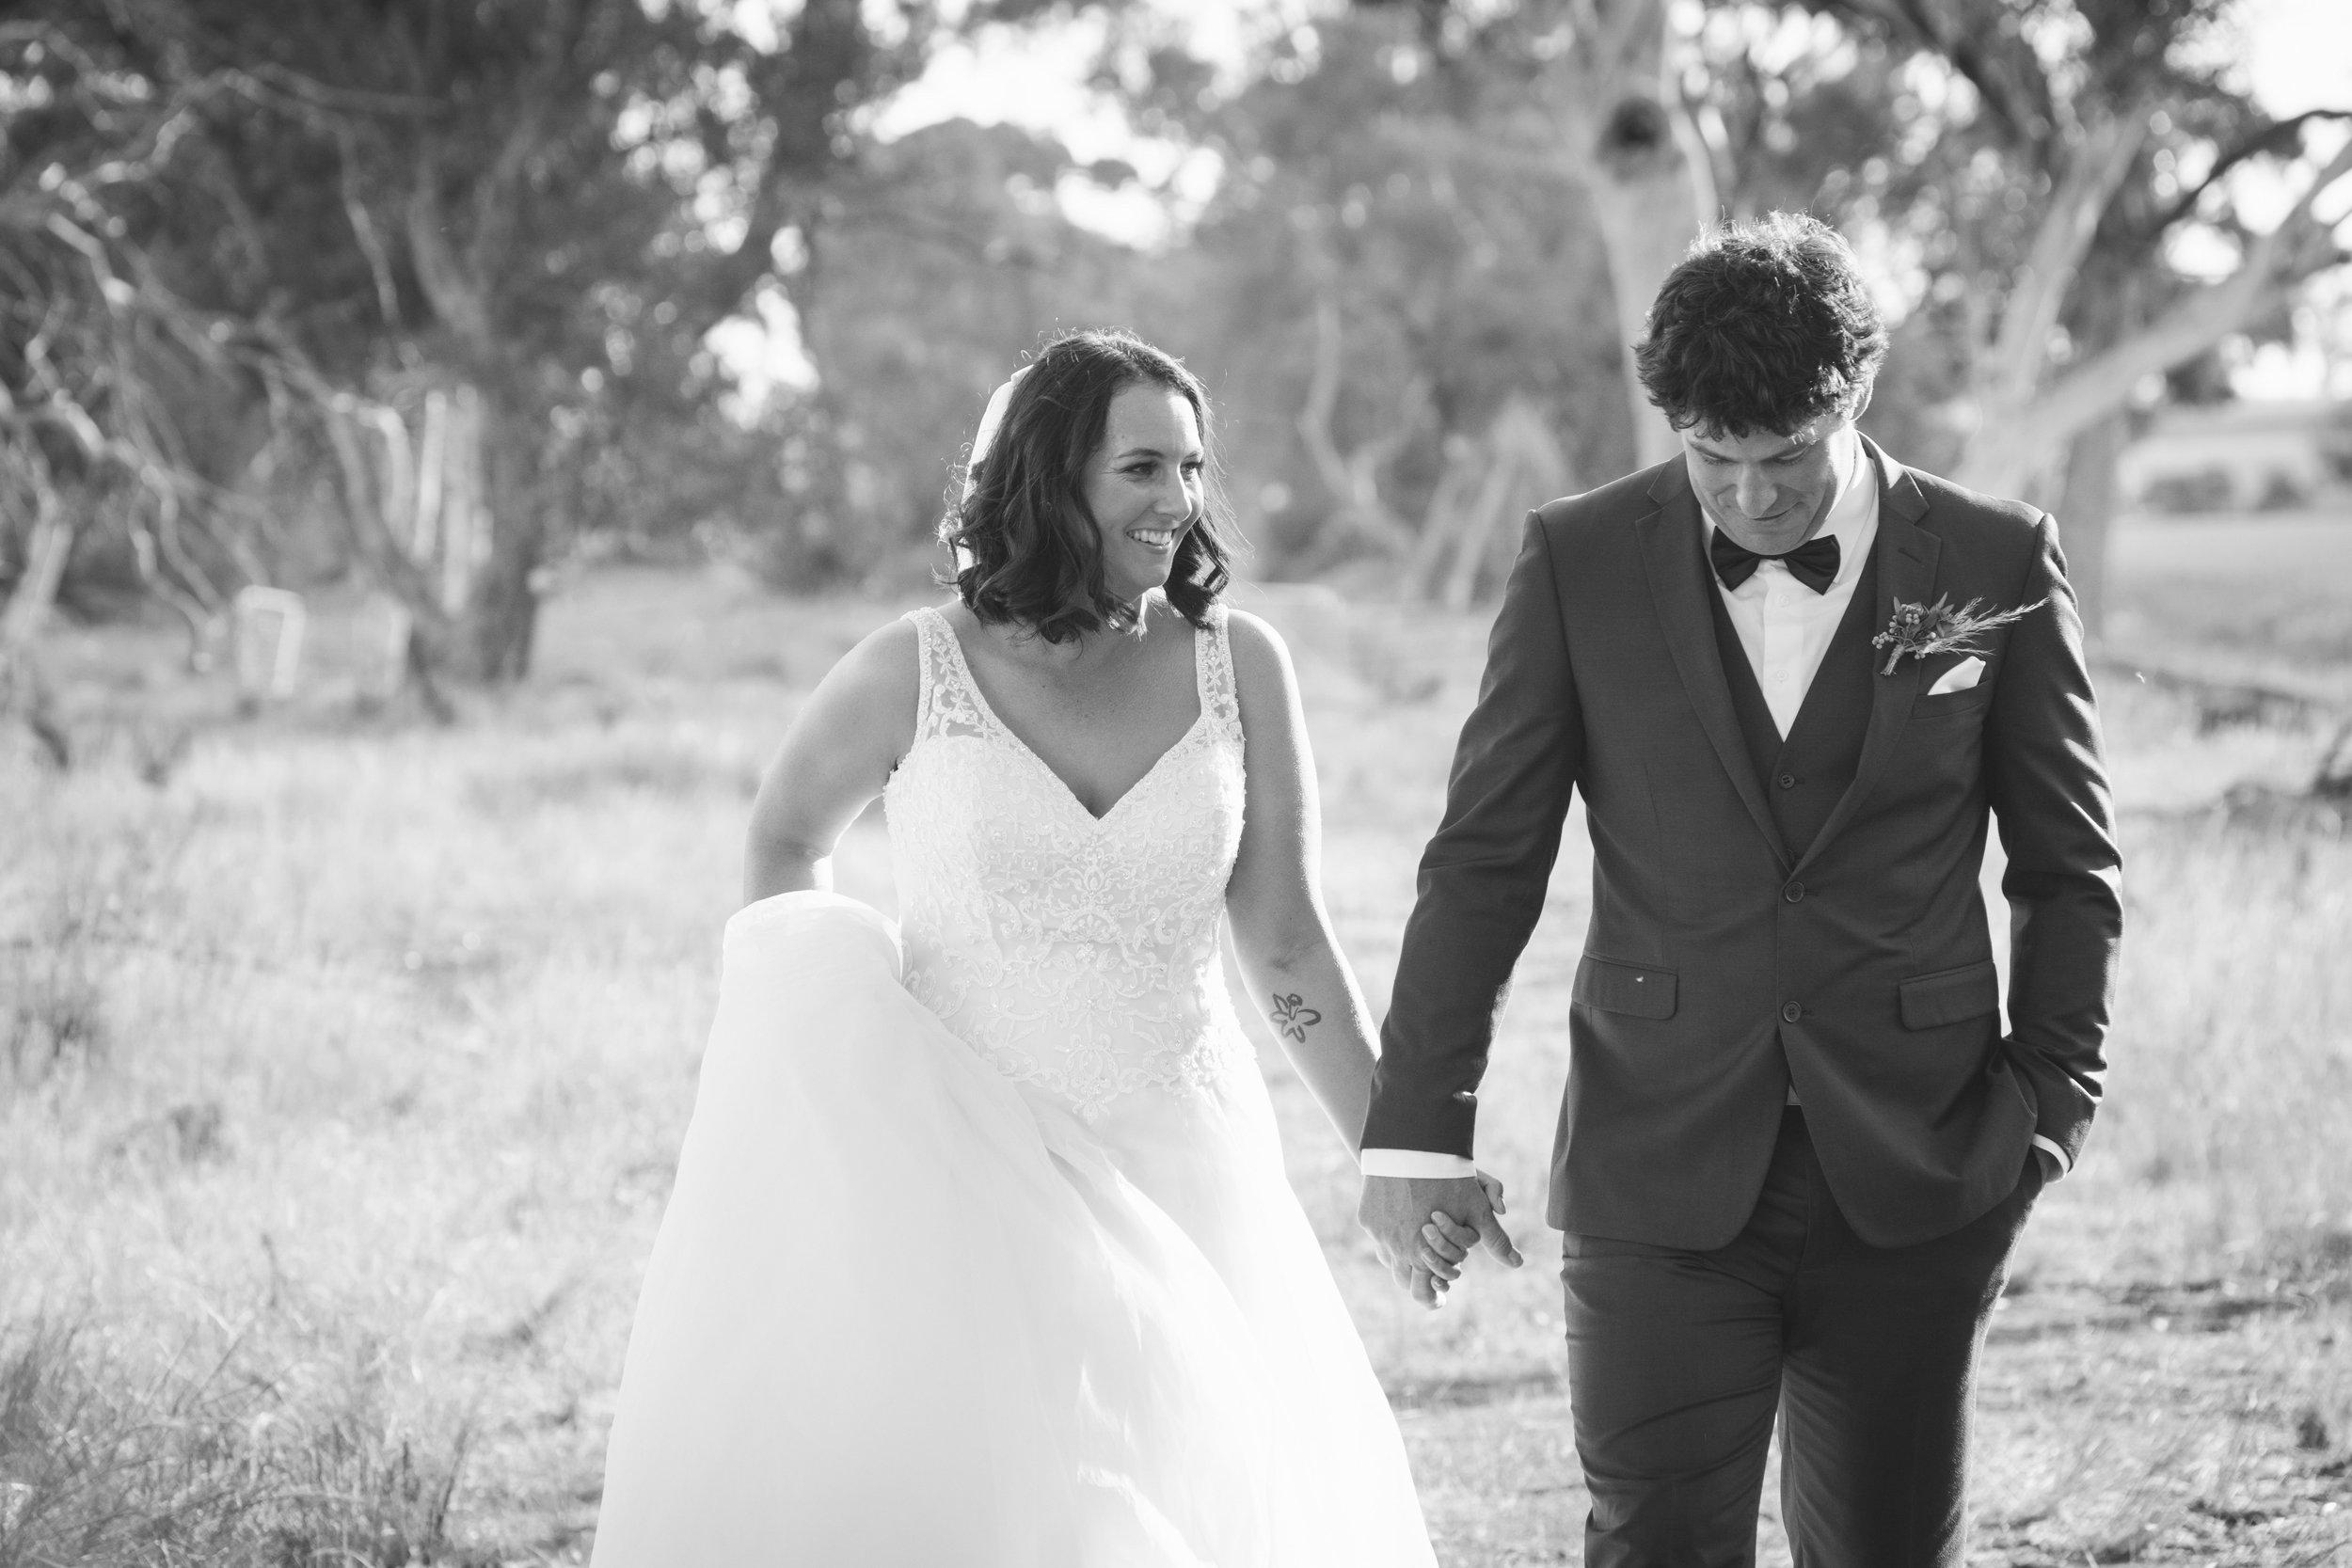 Angie Roe Photography Wheatbelt Avon Valley Farm Wedding (38).jpg